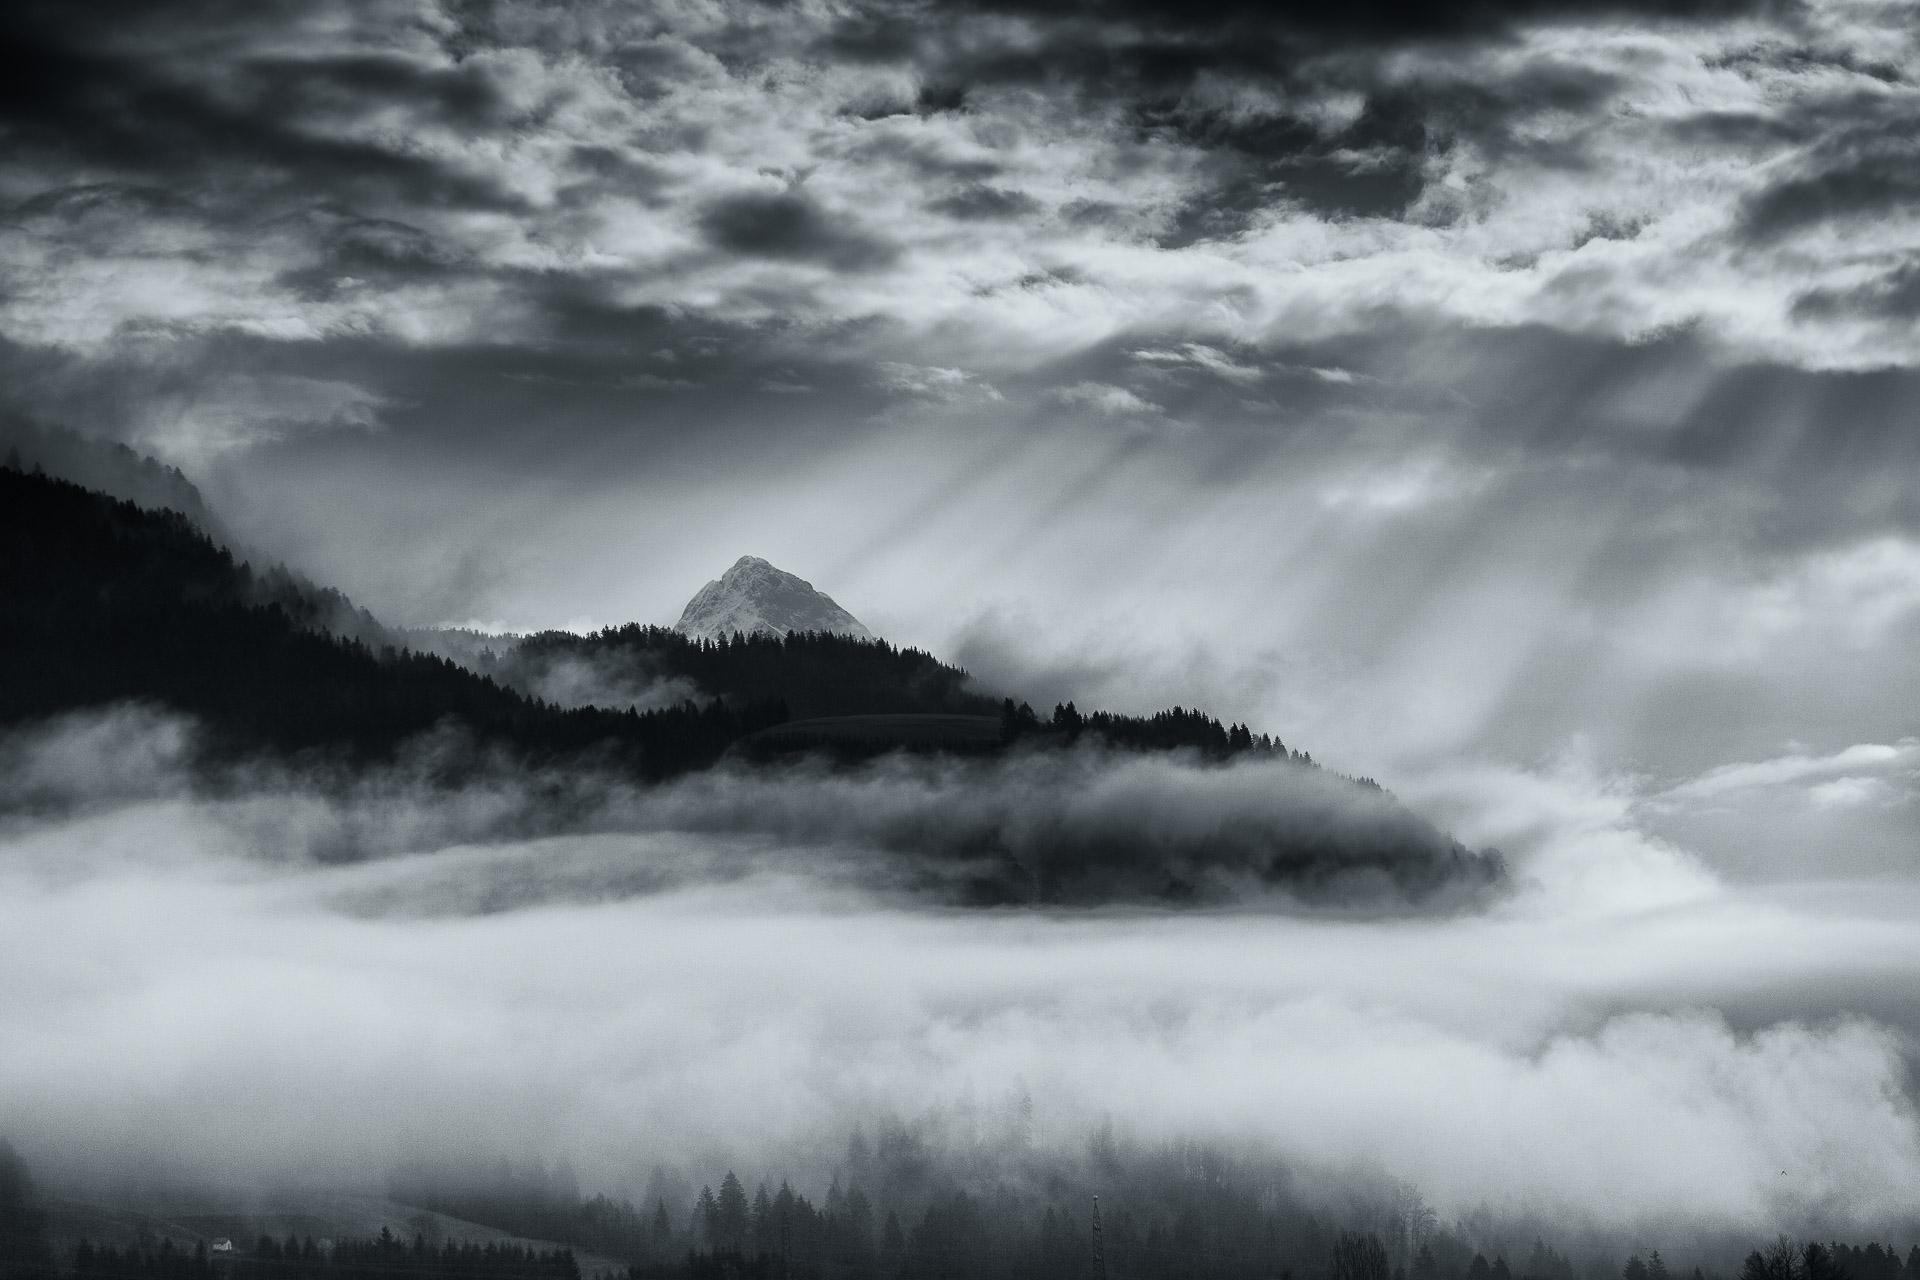 Mysterious mountain carnic alps carinthia austria